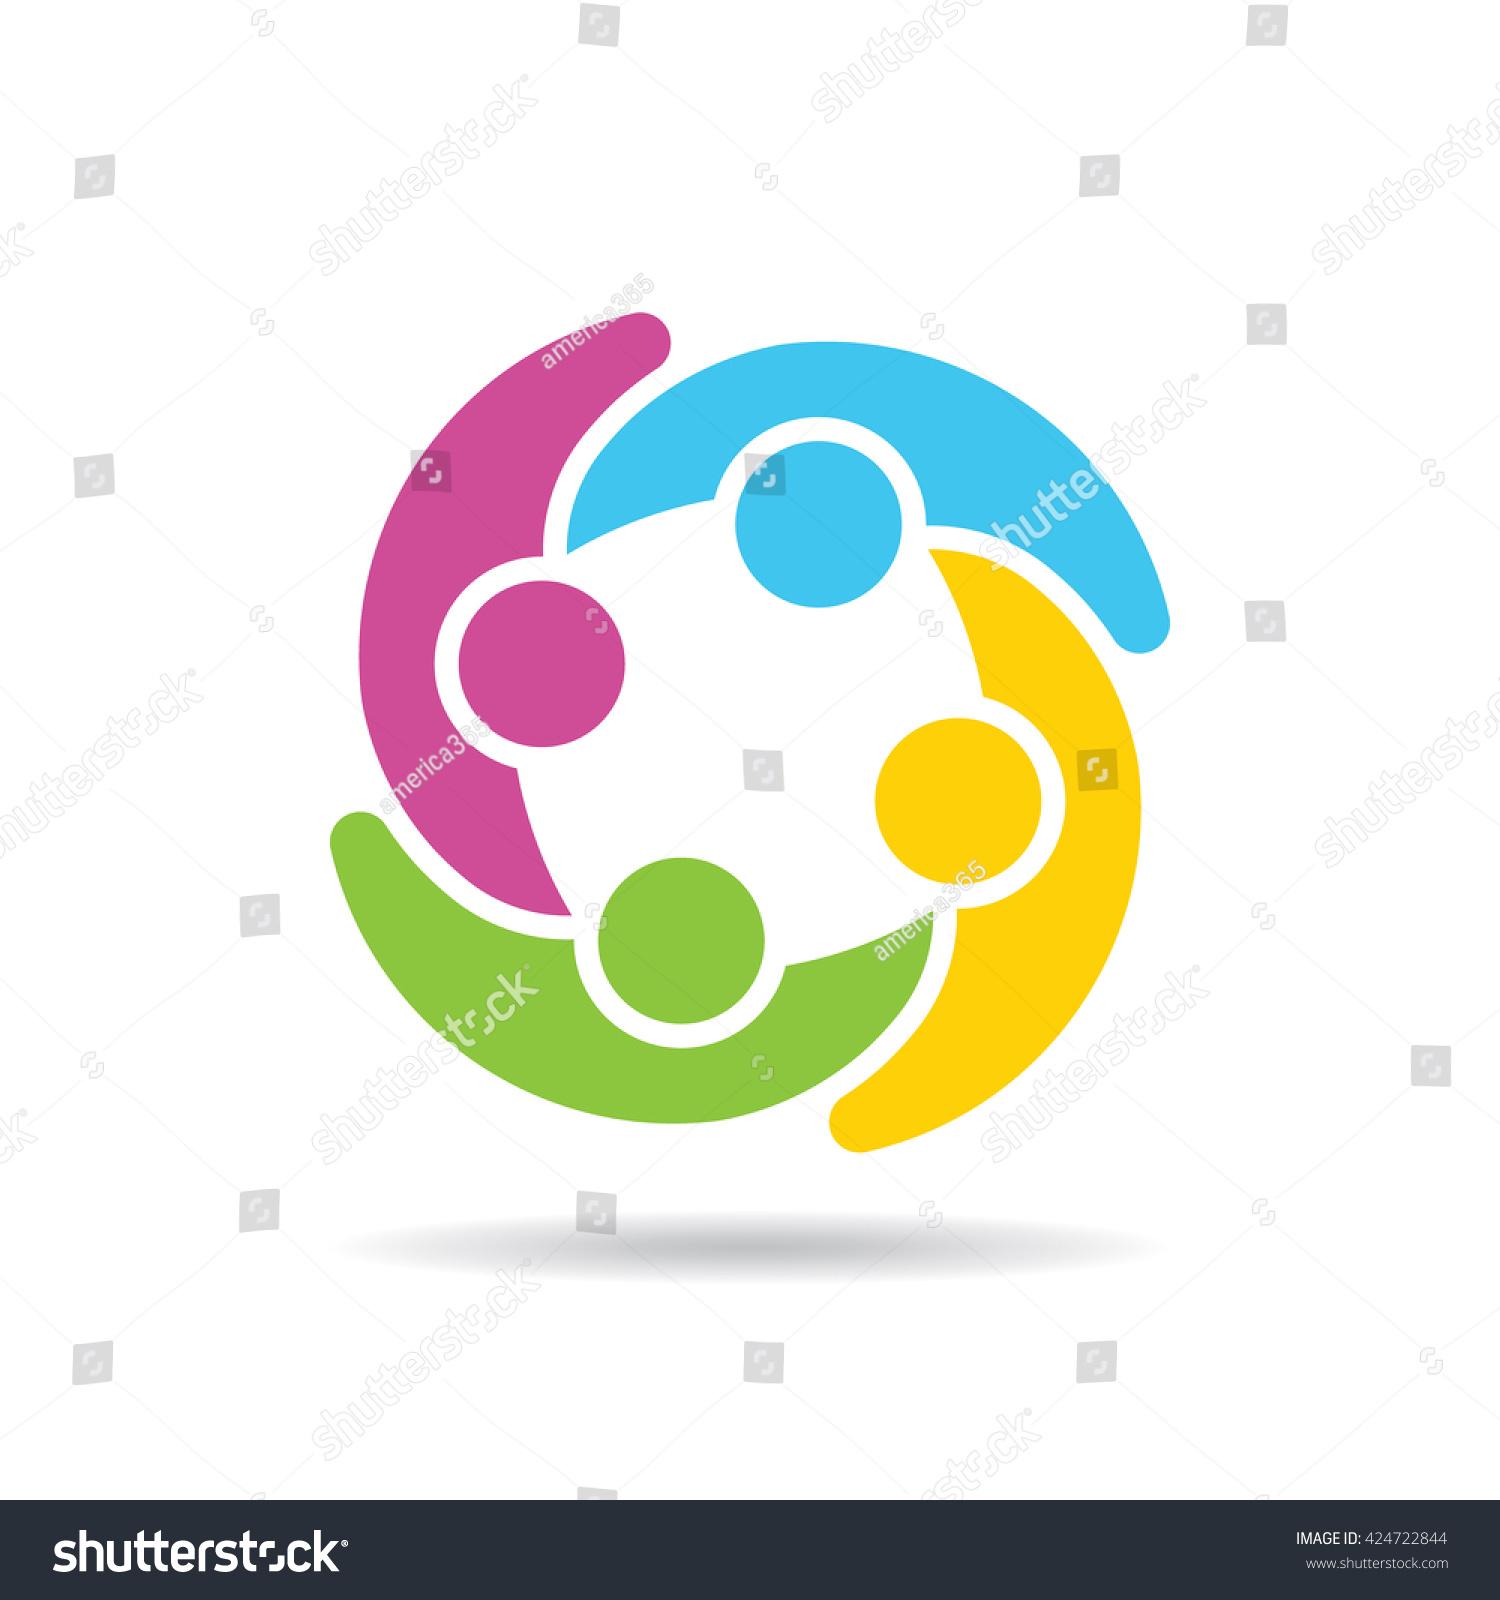 people group social network logo vector stock vector 424722844 rh shutterstock com logo using vector graphics logo using vector graphics